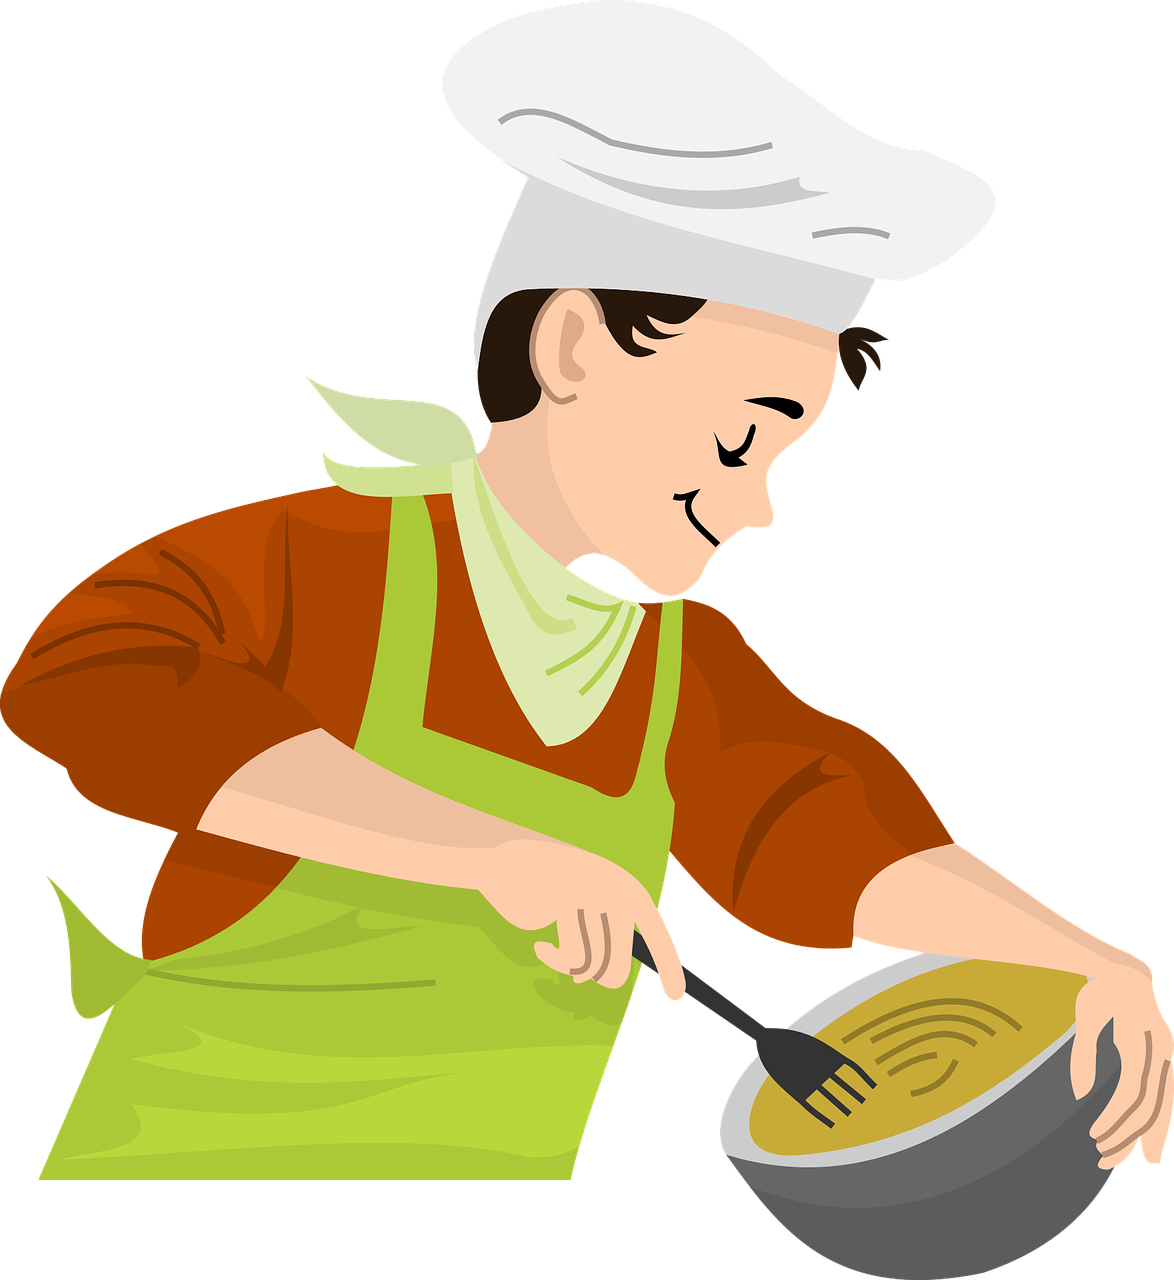 Cook making food